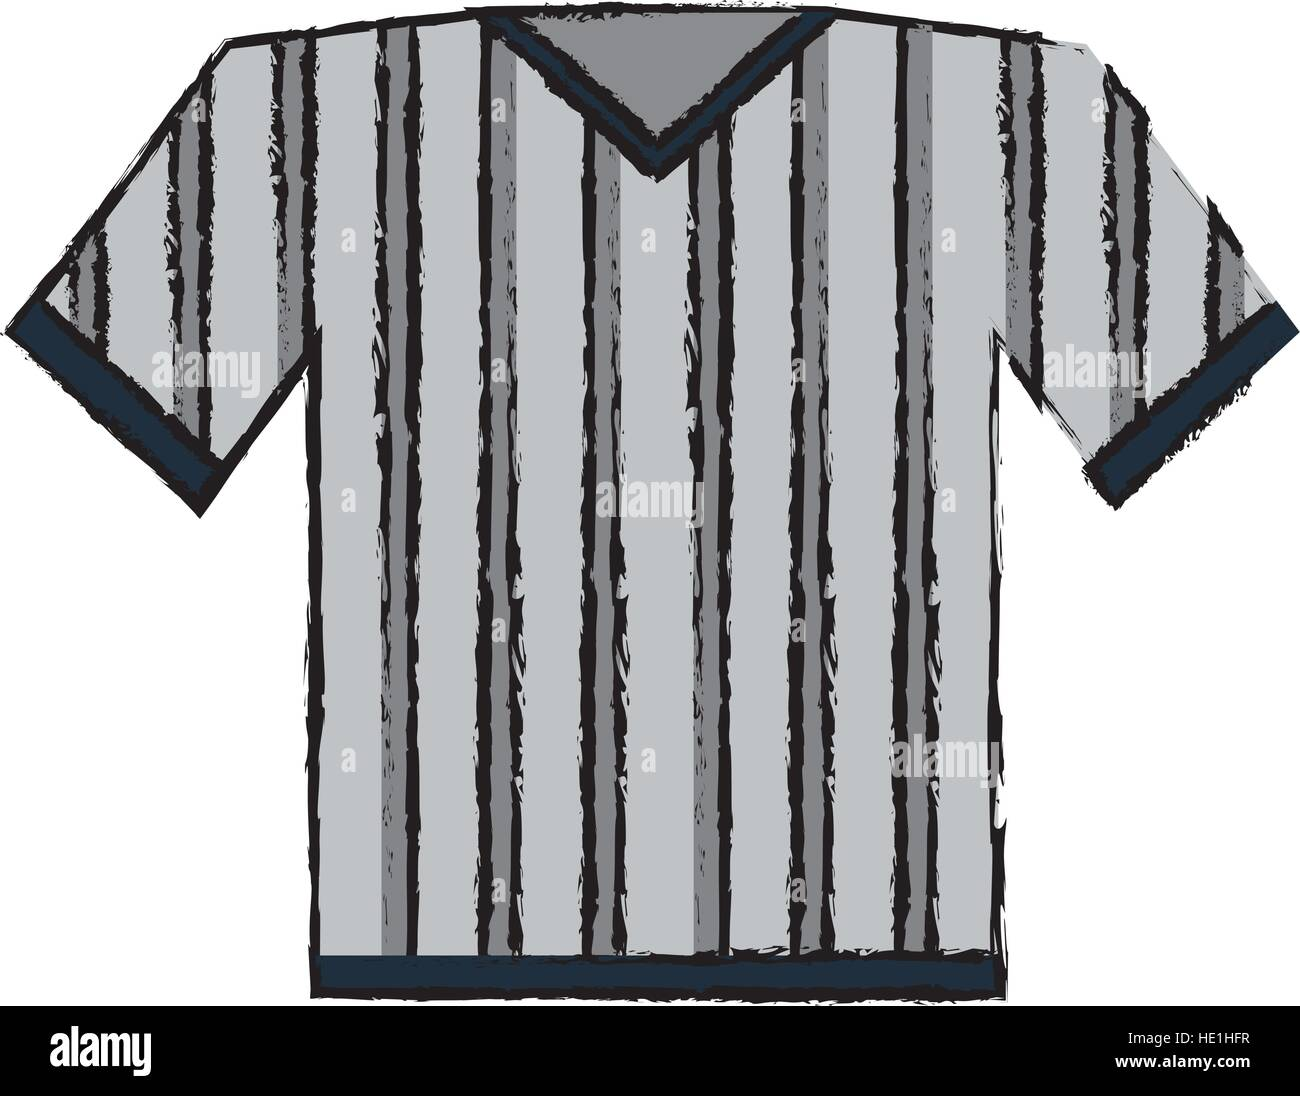 drawing jersey referee american football stock vector art